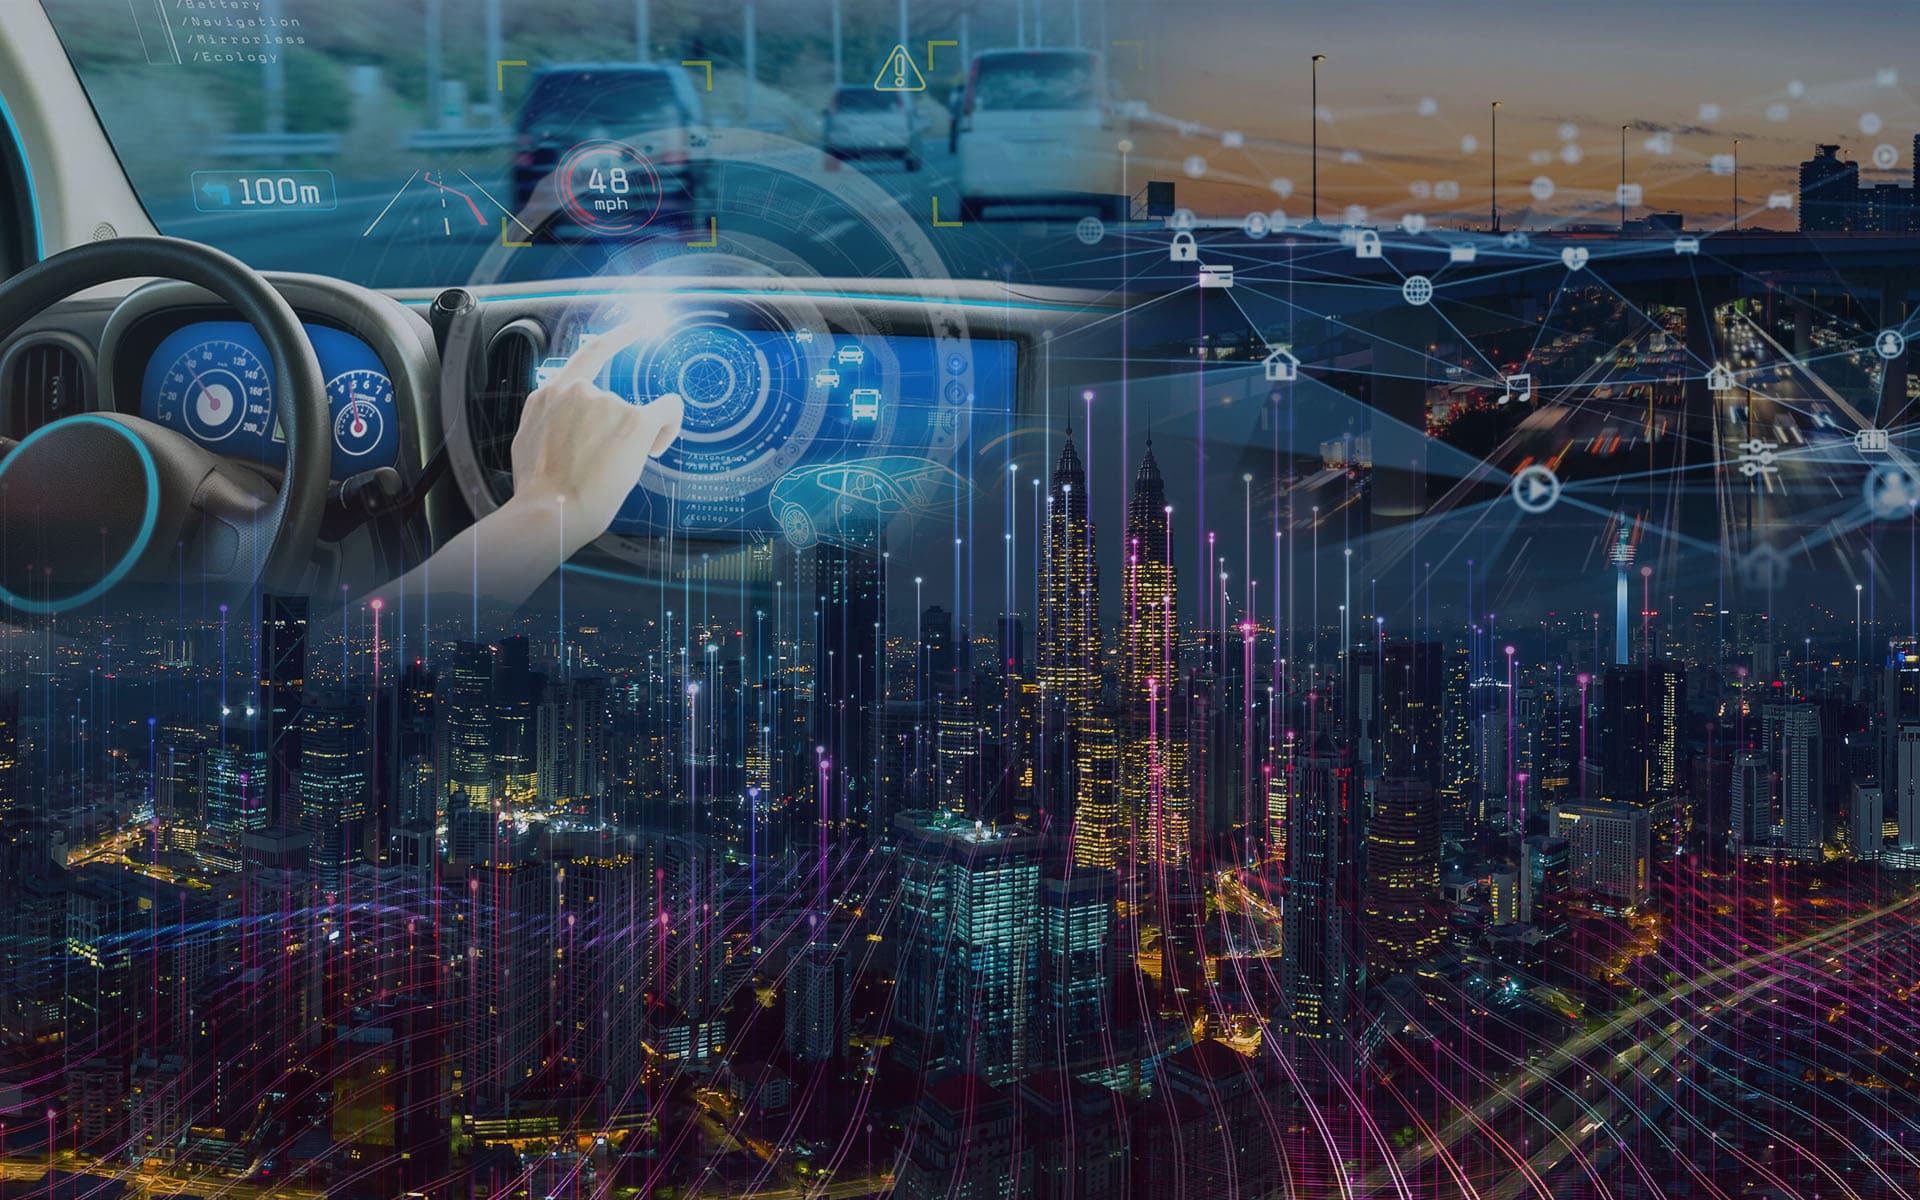 5G test mmWave Automotive Radar Testing - SPEA